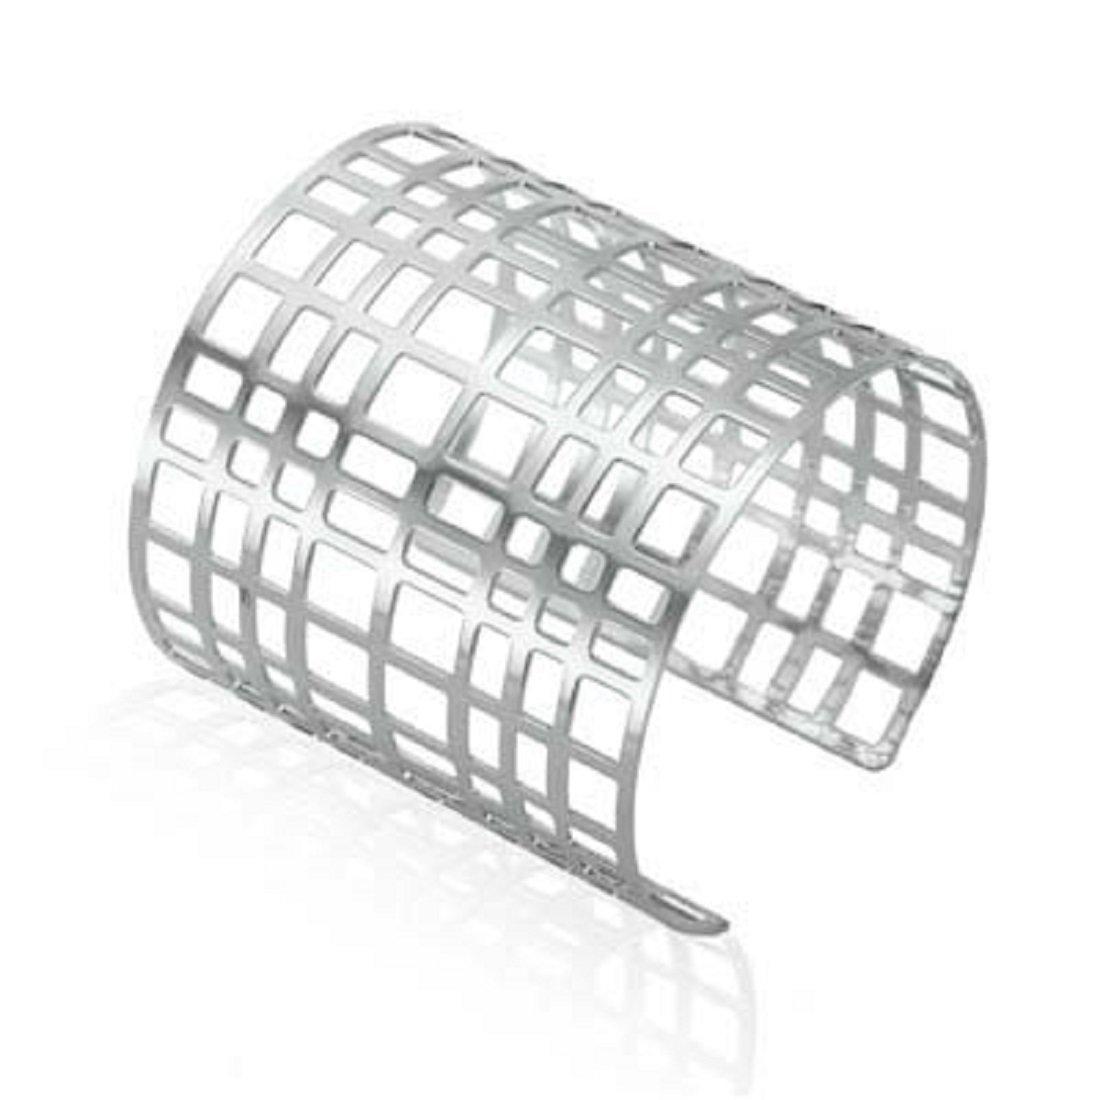 Rima Imar Silver Square Cut Bracelet